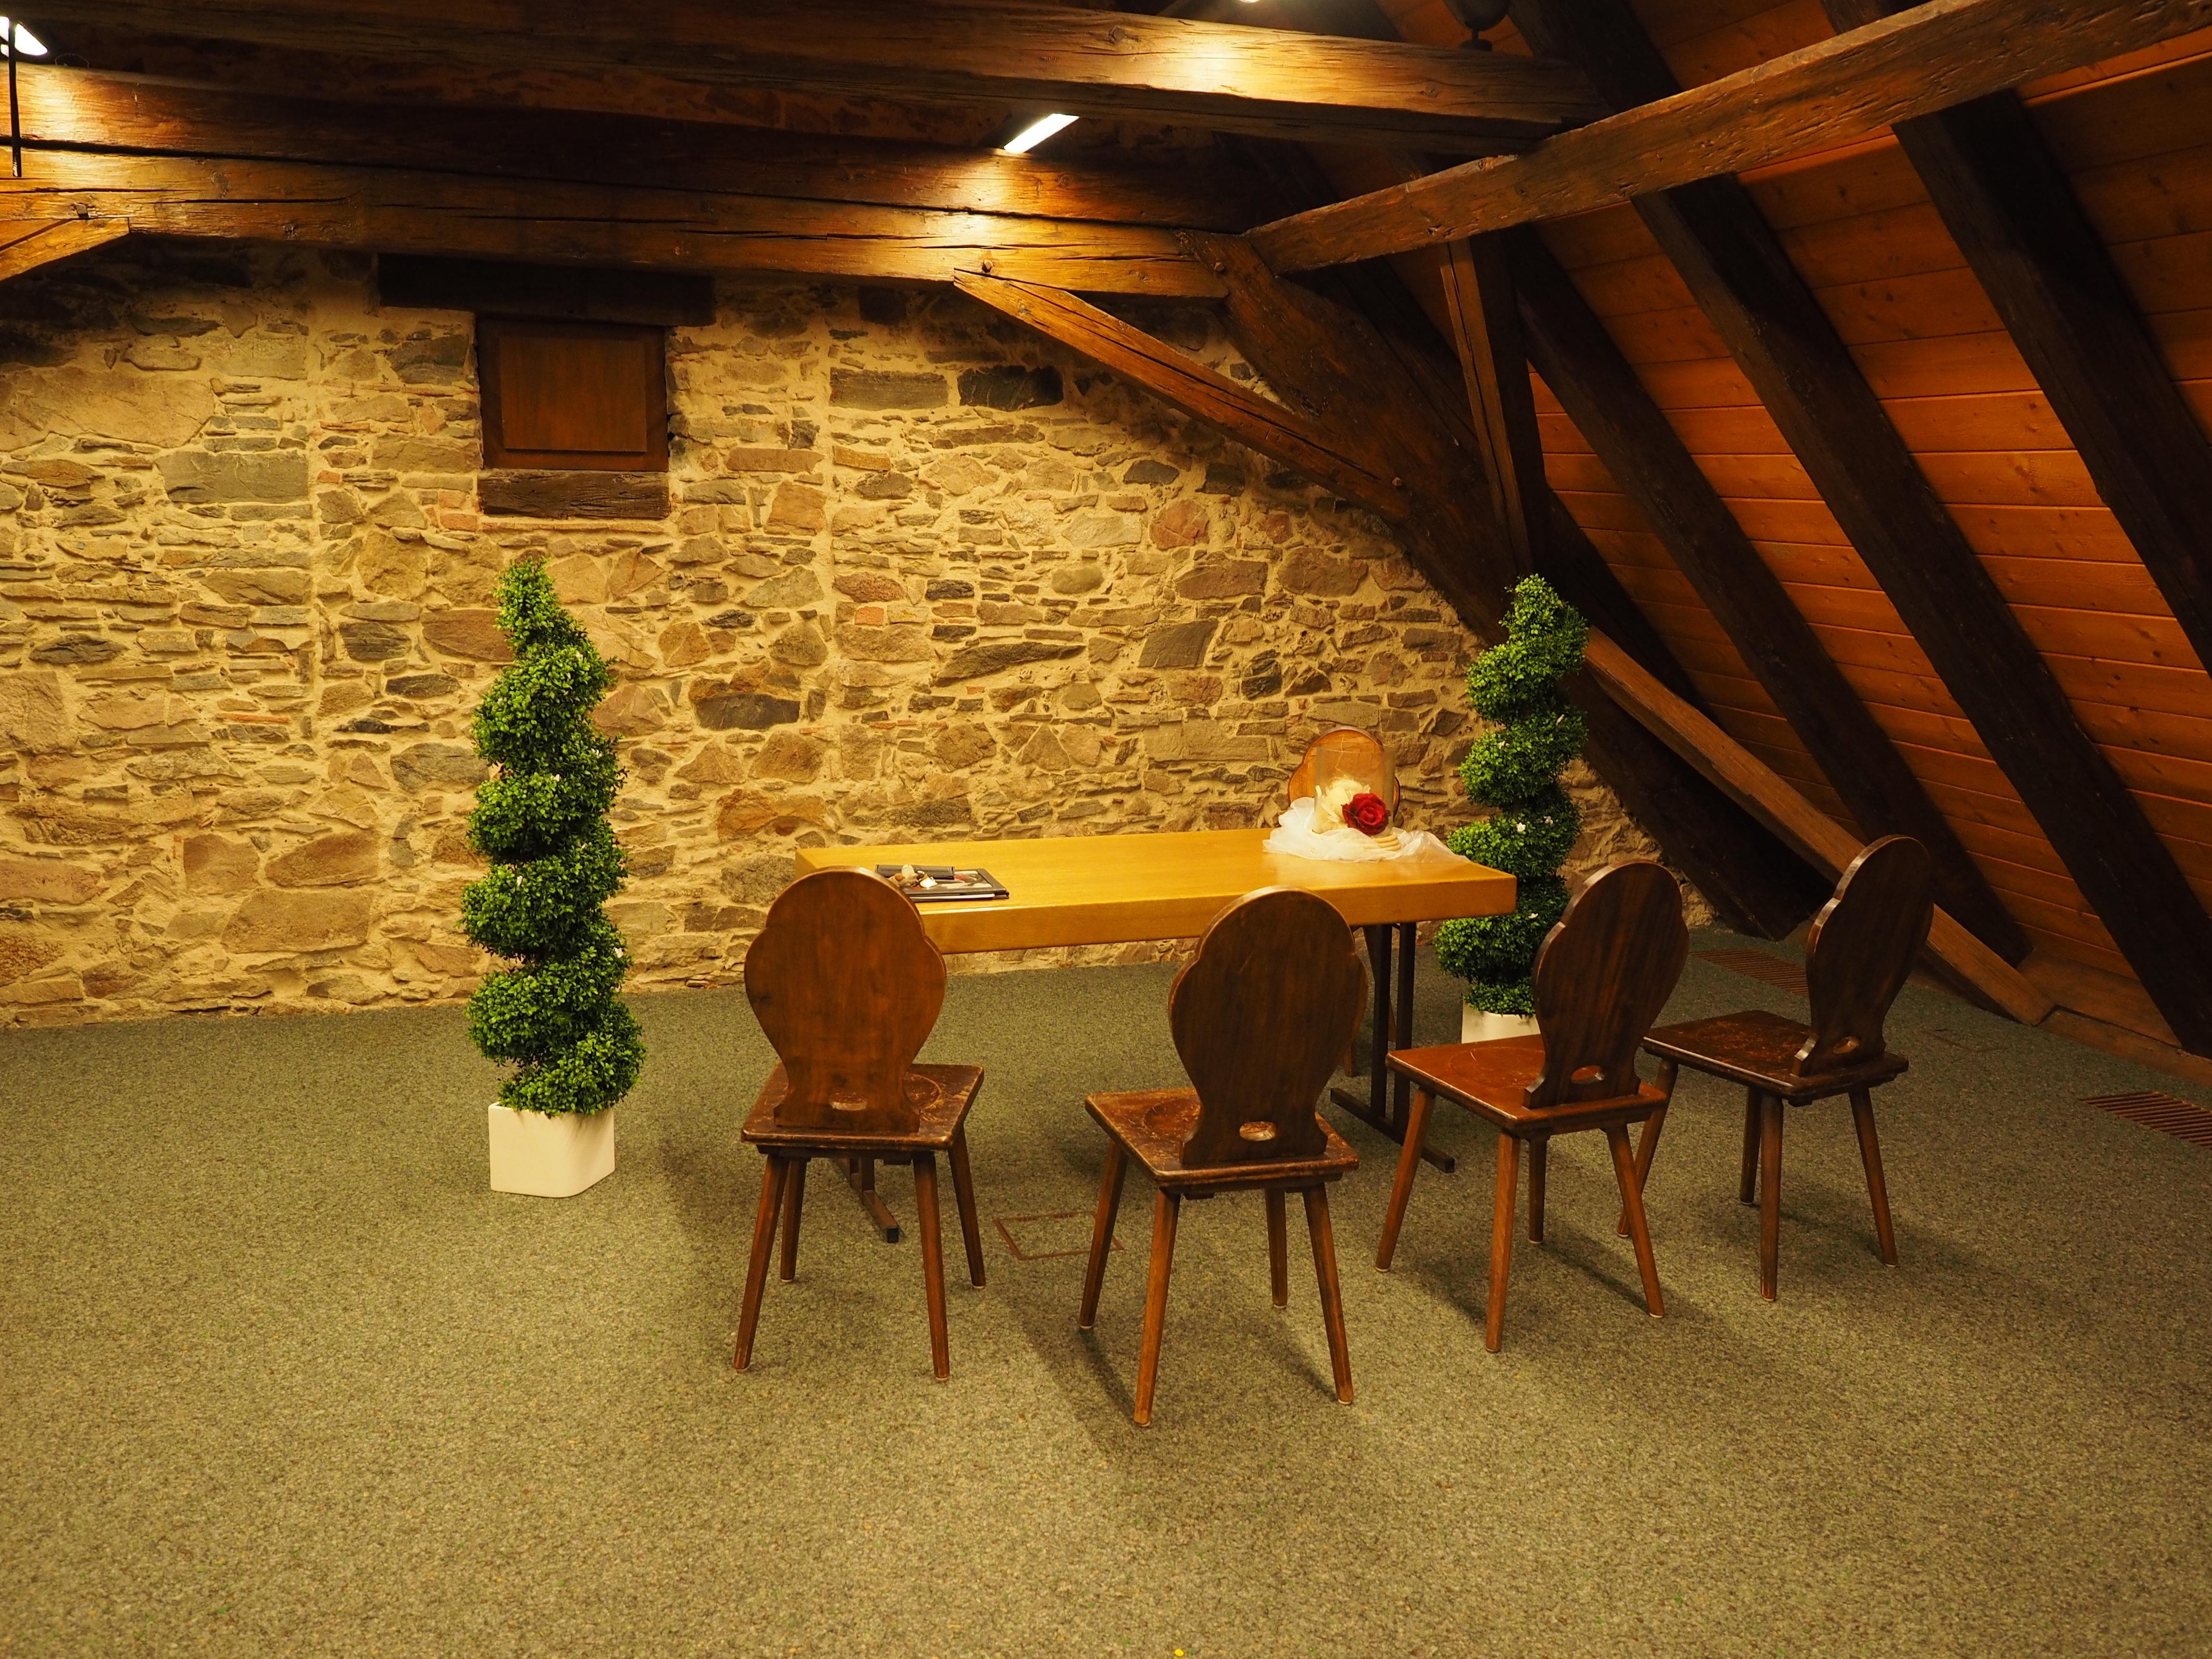 Fotos gratis madera casa restaurante antiguo espacio - Diseno de interiores gratis ...